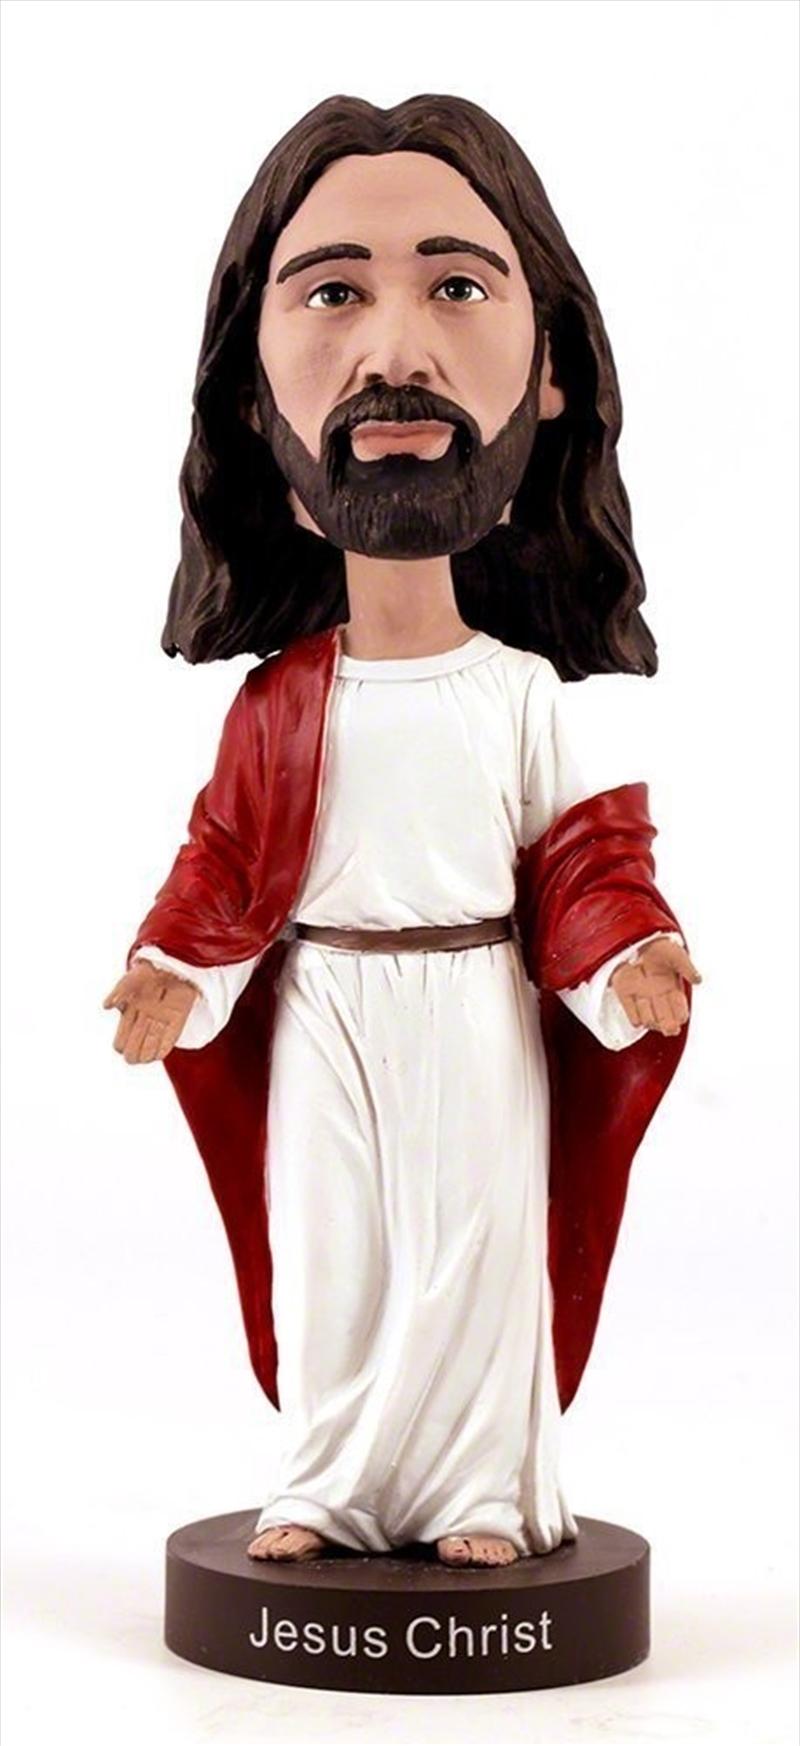 Bobblehead Jesus Christ Version 2 8' | Merchandise